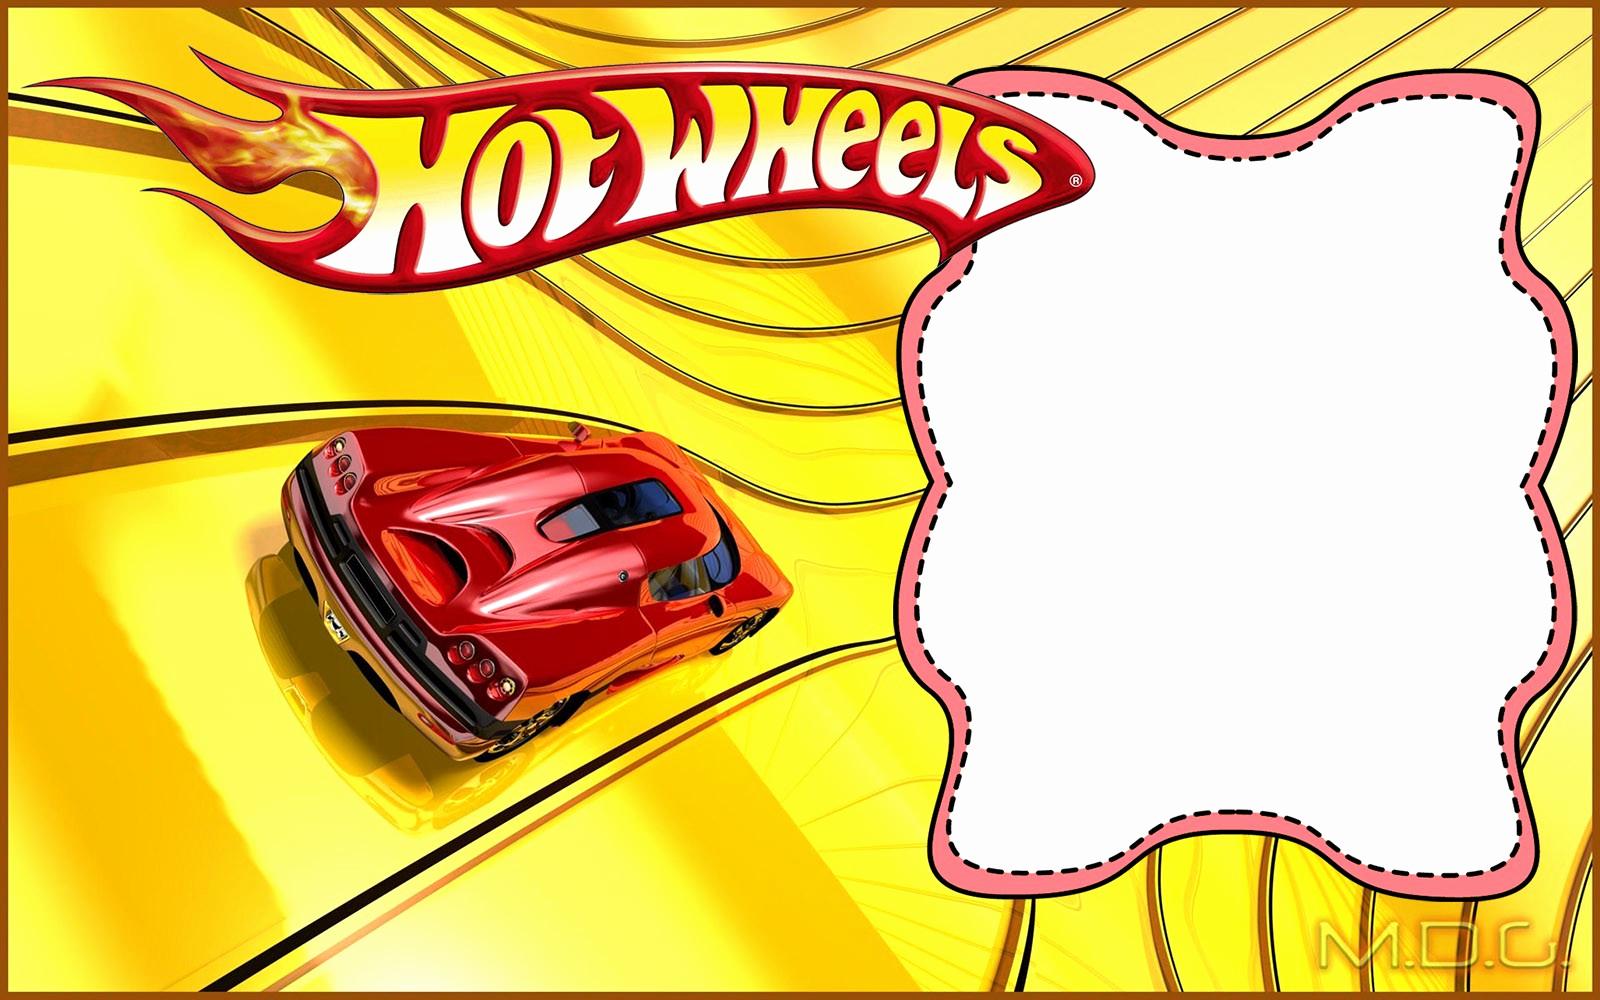 Hot Wheels Invitation Template Beautiful Free Printable Hot Wheels Invitation Templates for Download